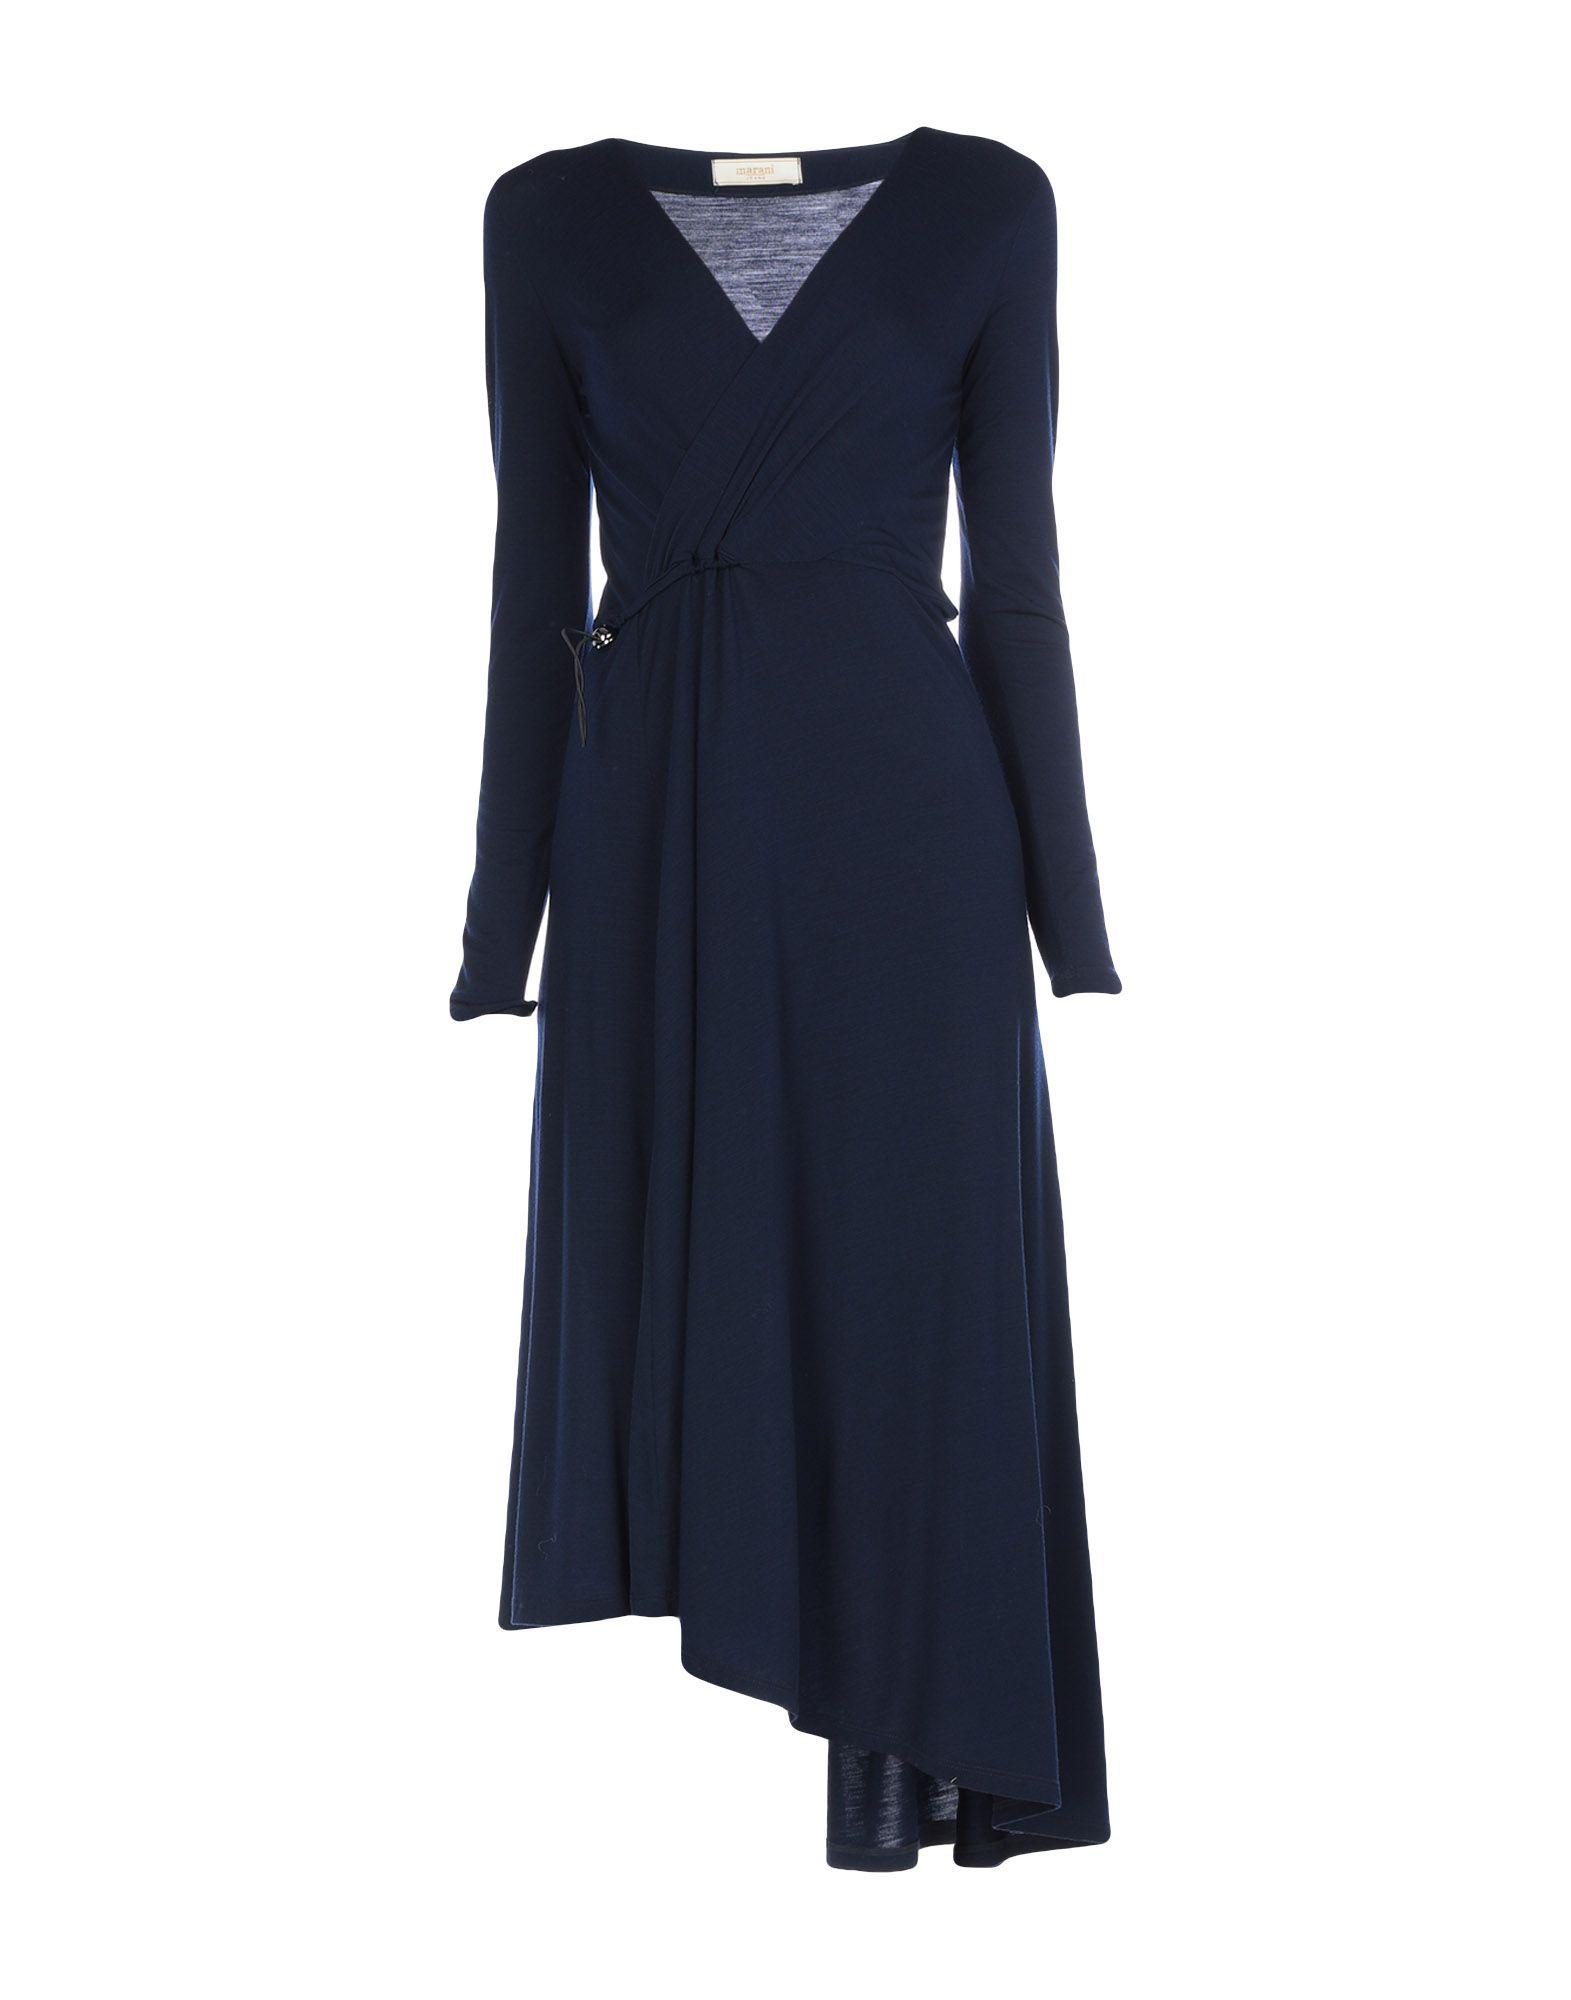 купить MARANI JEANS Платье до колена по цене 12750 рублей